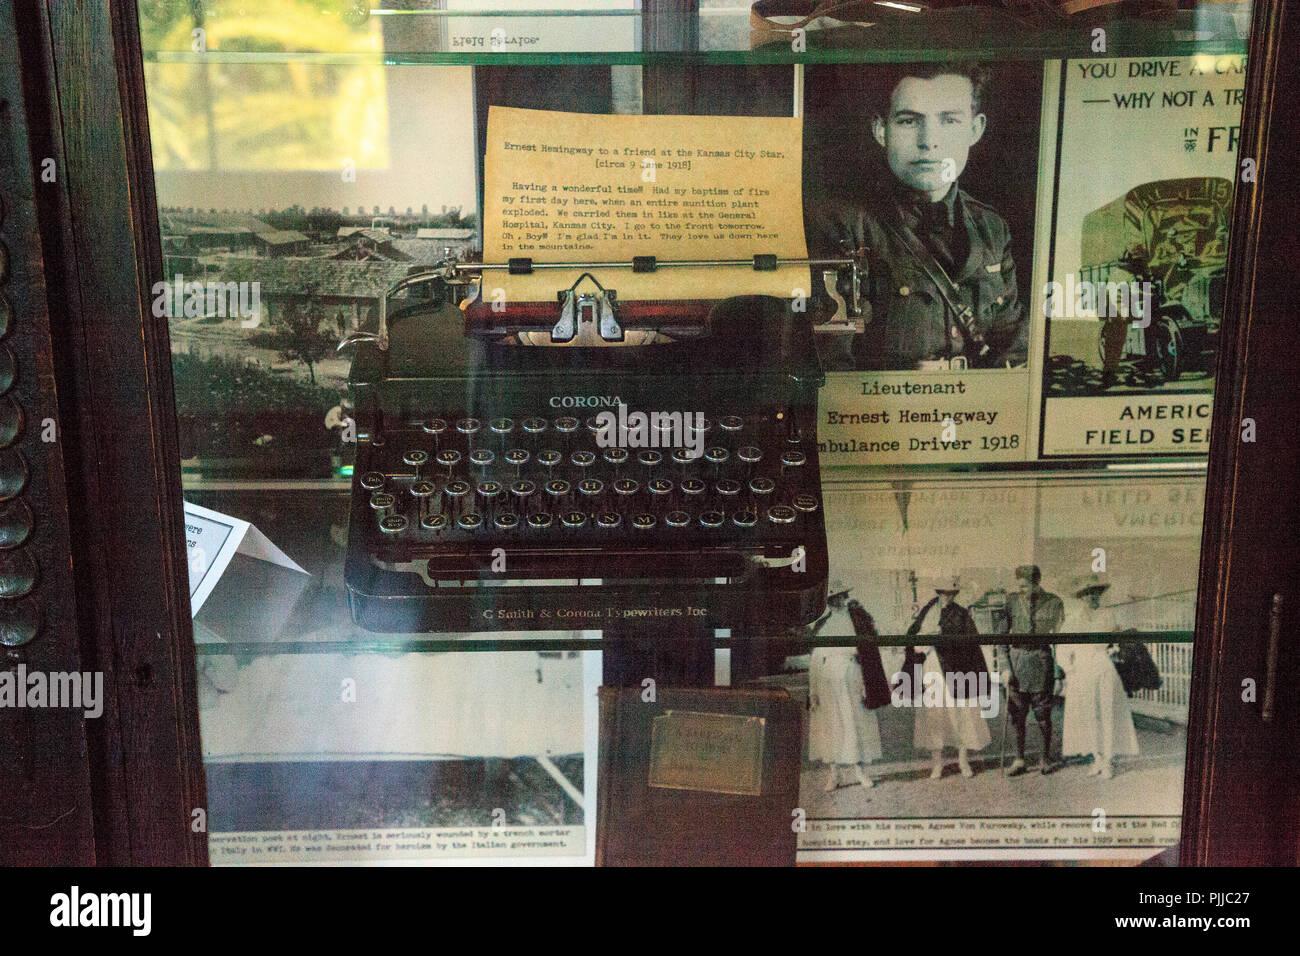 Key West, Florida, USA - September 1, 2018: Typewriter at Ernest Hemingway's House in Key West, Florida. For editorial use. Stock Photo